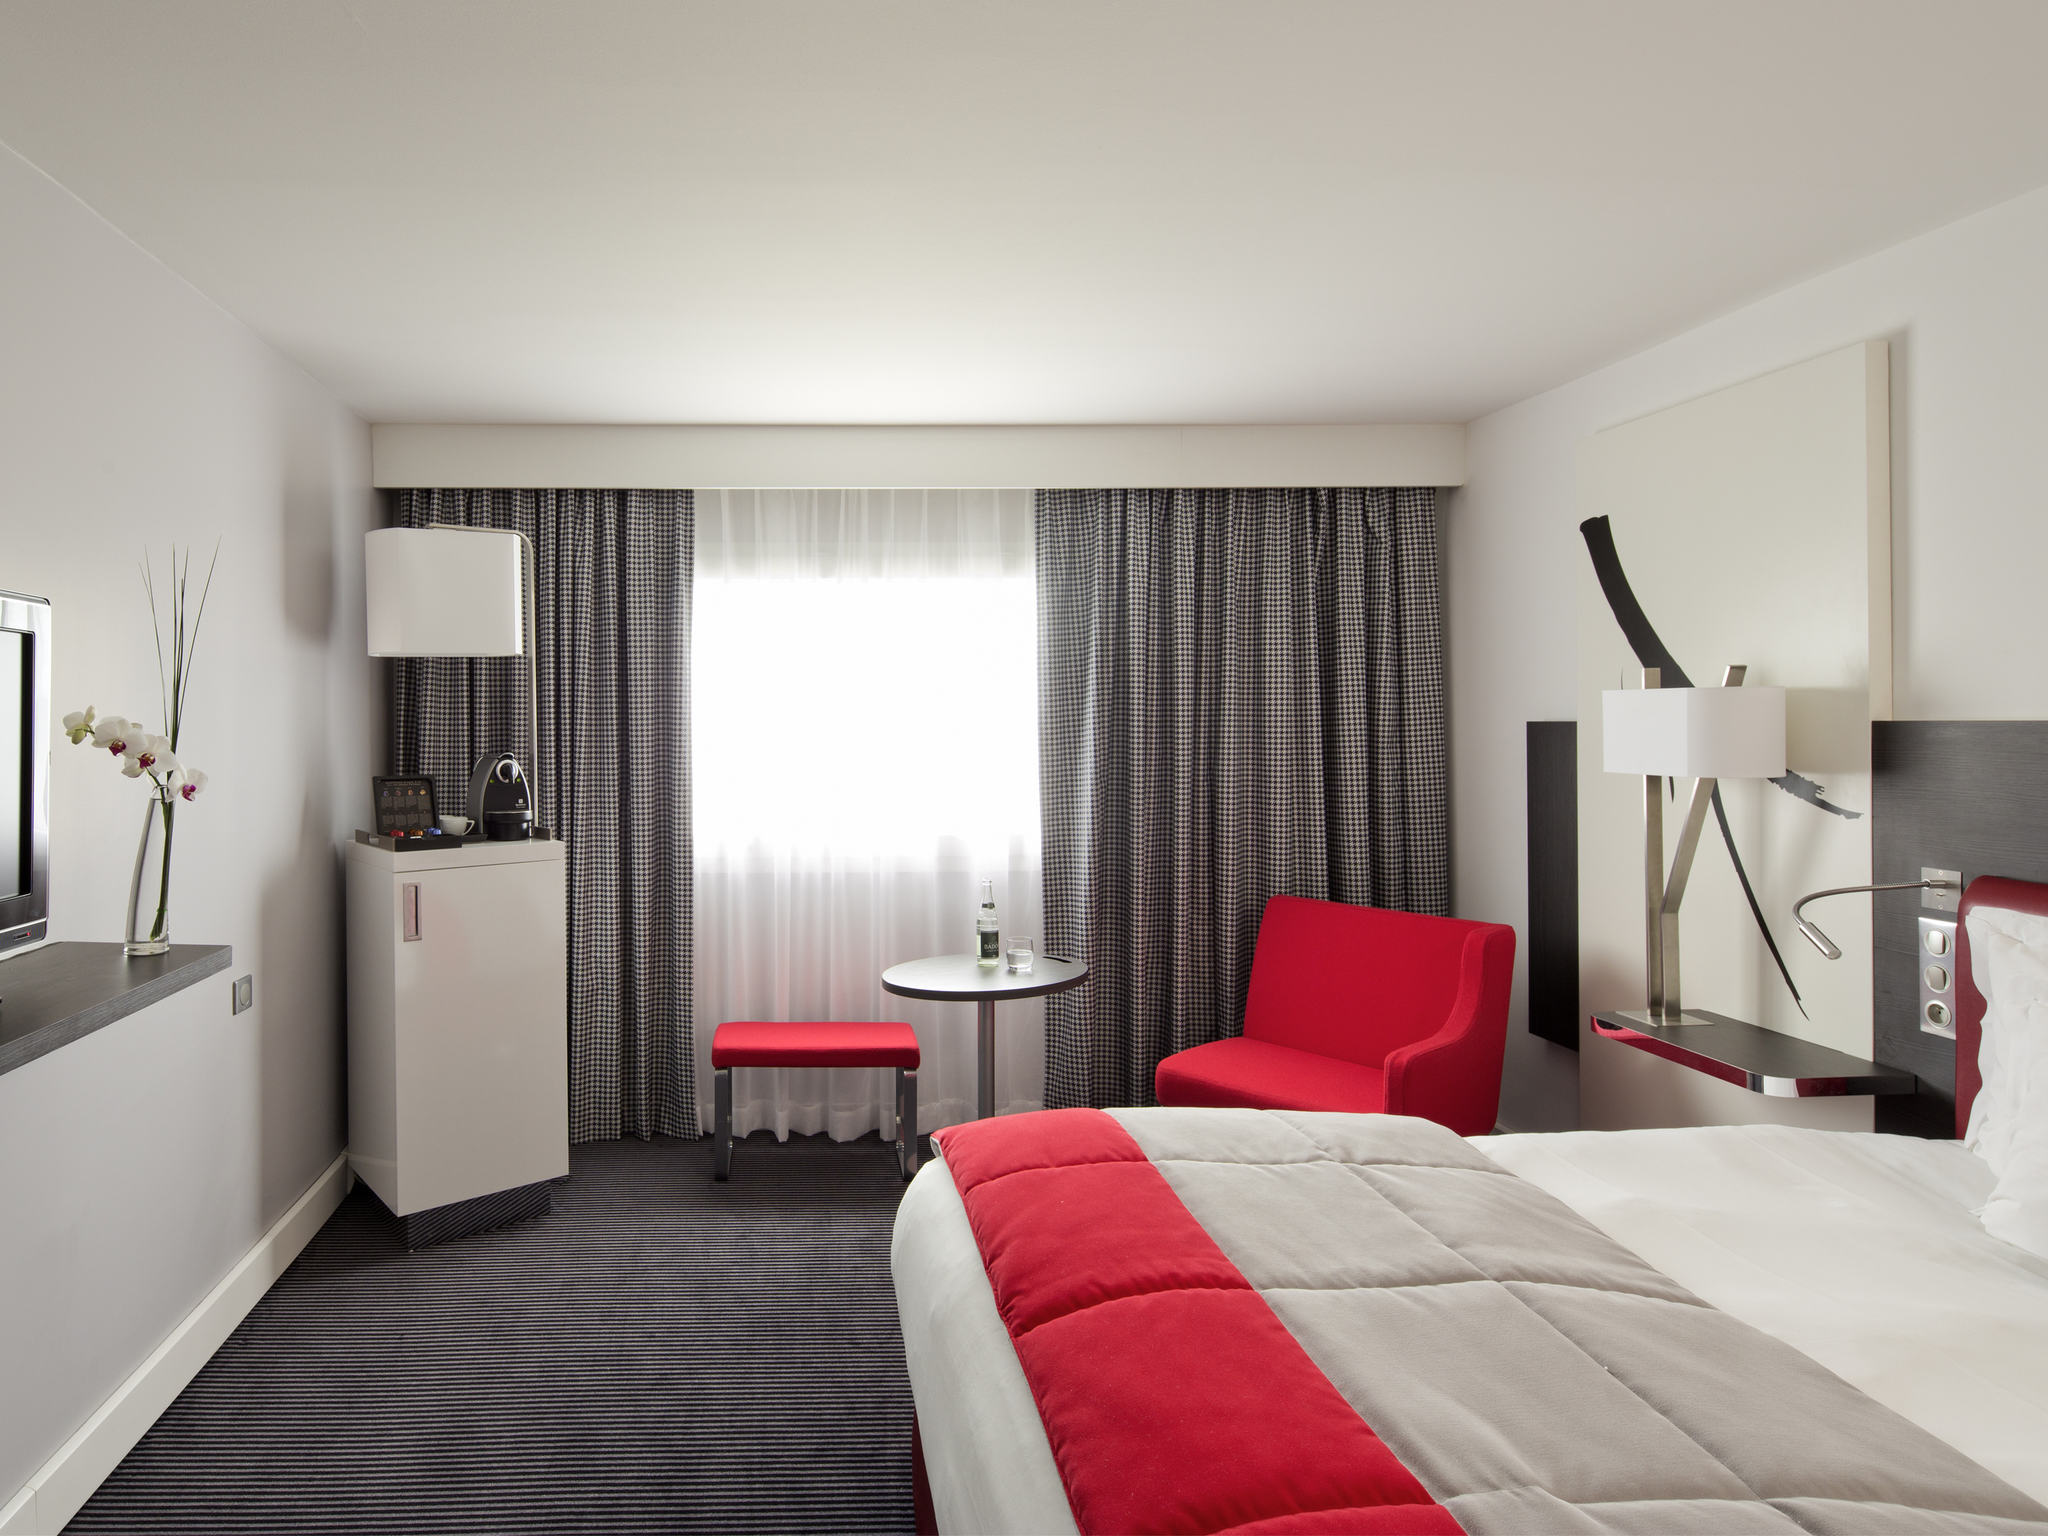 Hotel – Hotel Mercure Paris CDG Airport & Convention